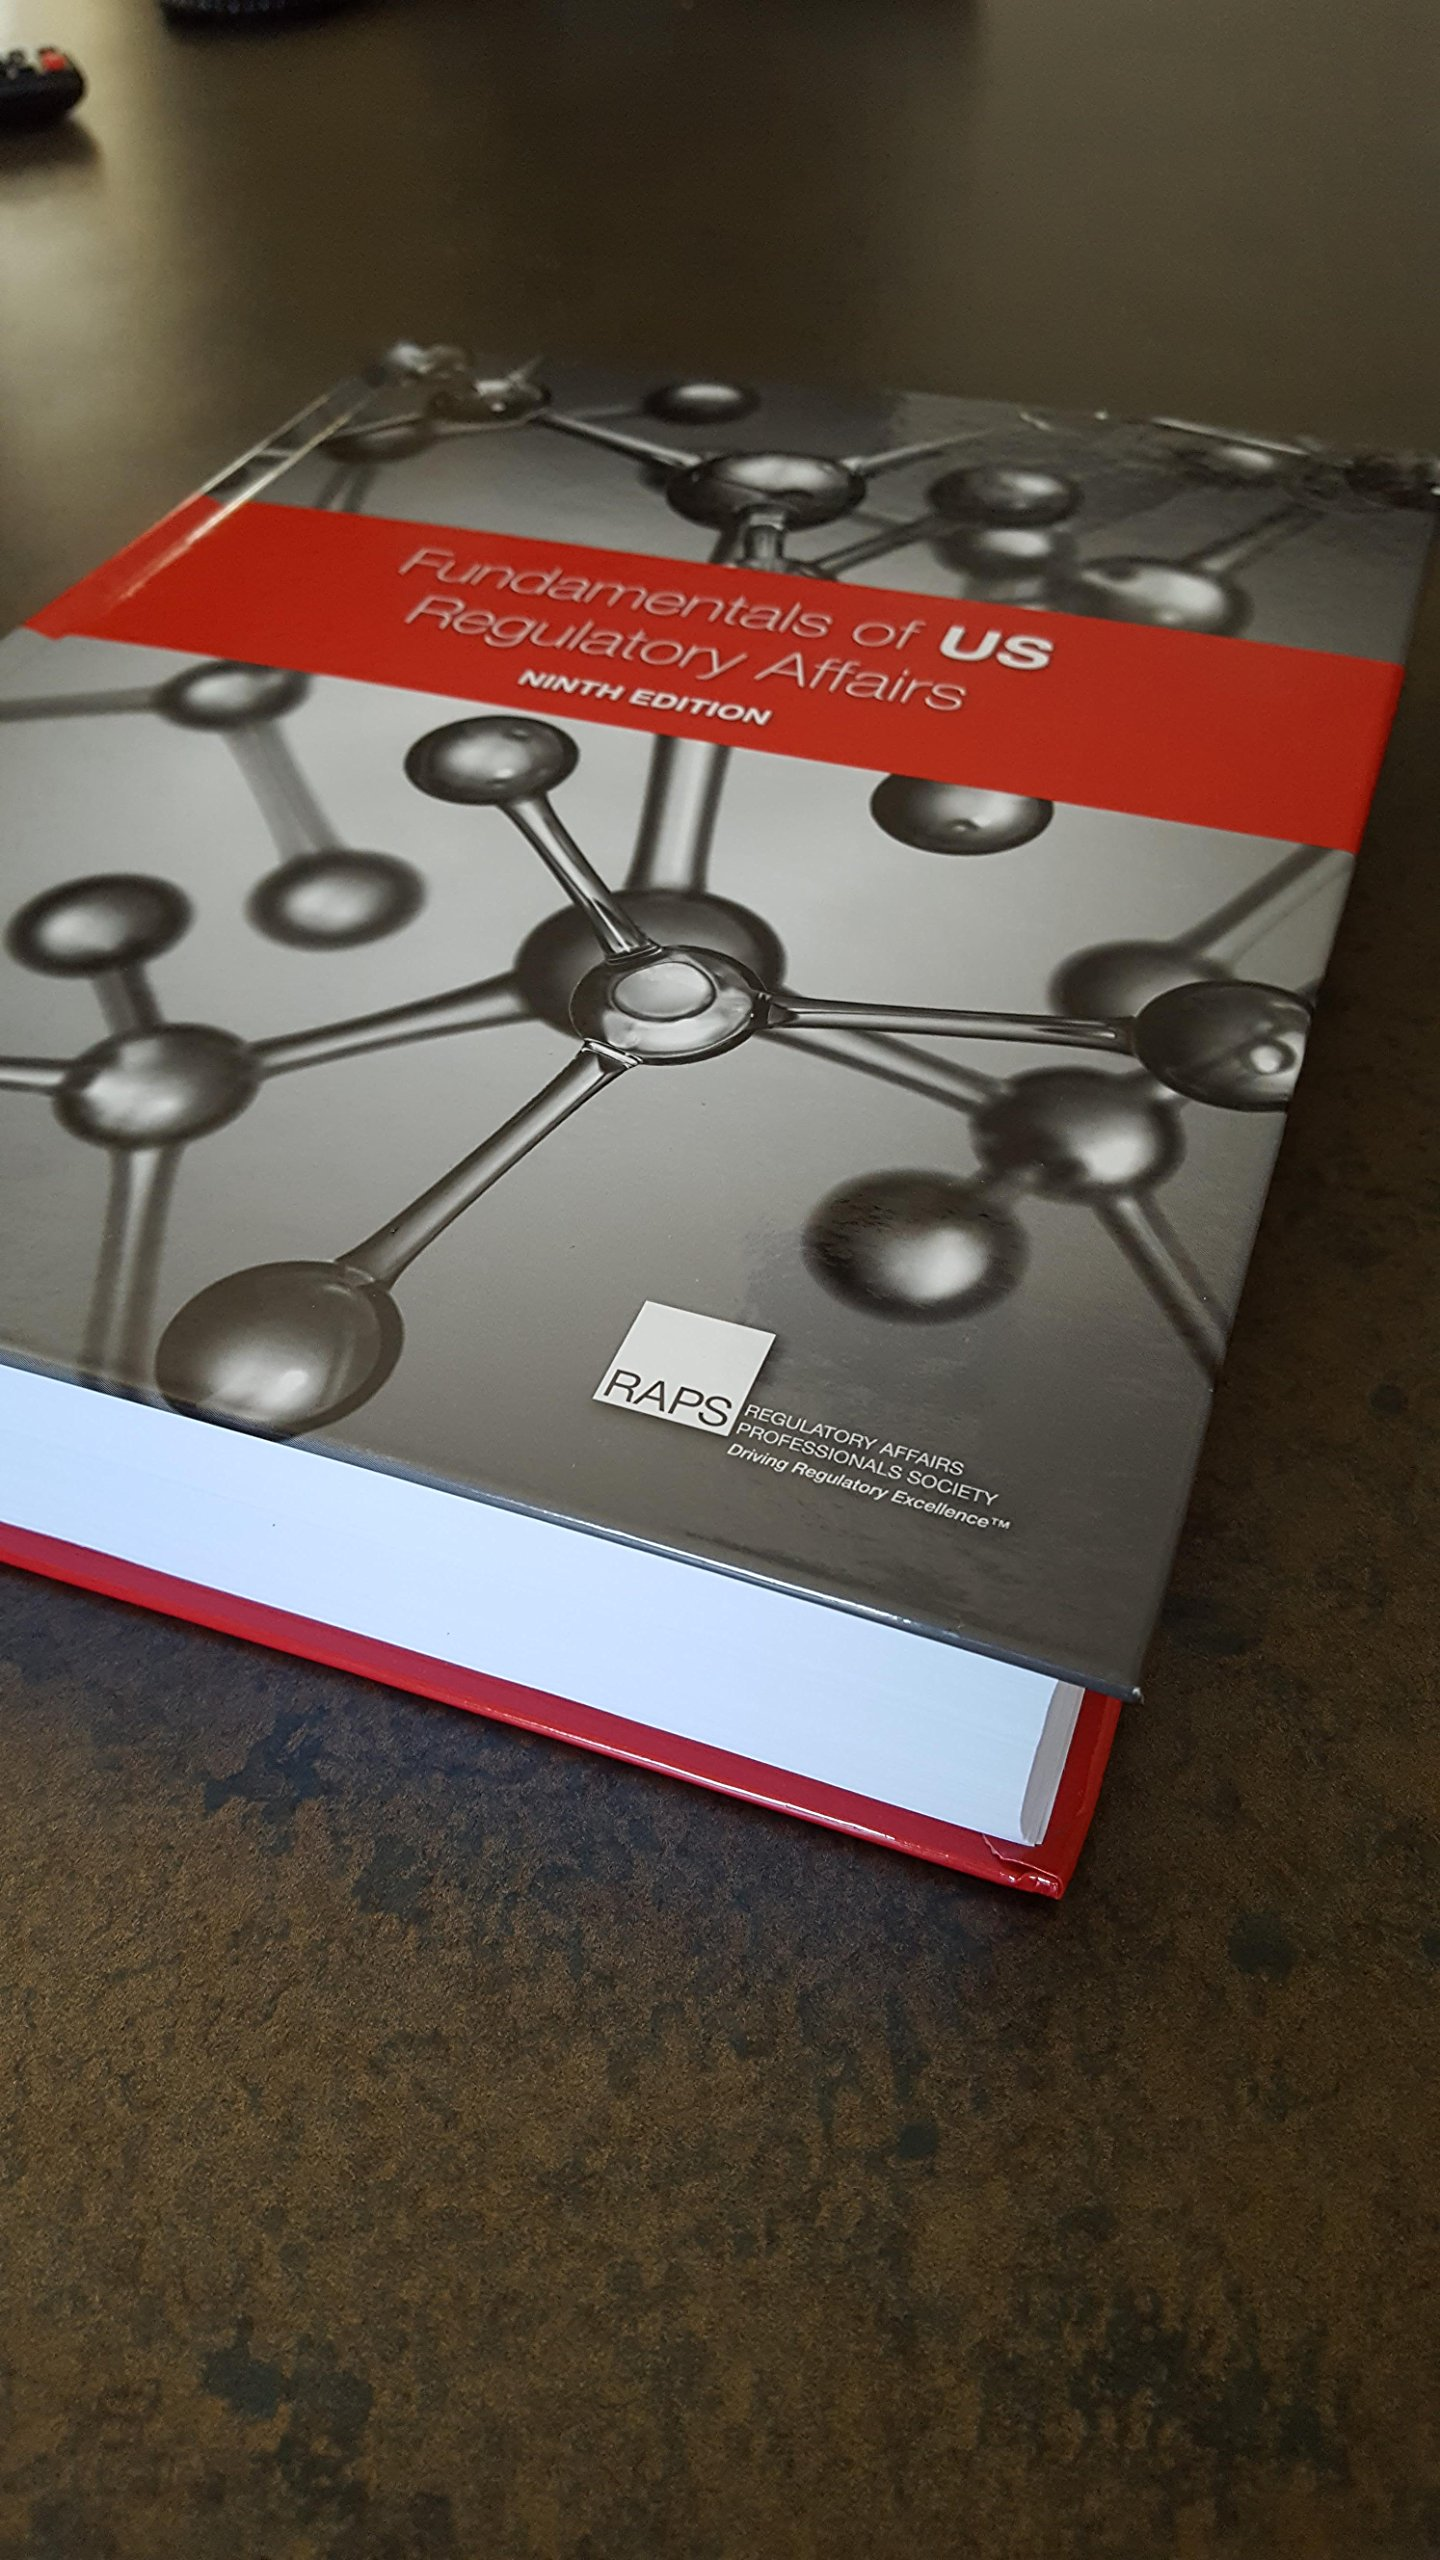 Fundamentals of US Regulatory Affairs Ninth edition: RAPS, Pamela A. Jones:  9780967311586: Amazon.com: Books